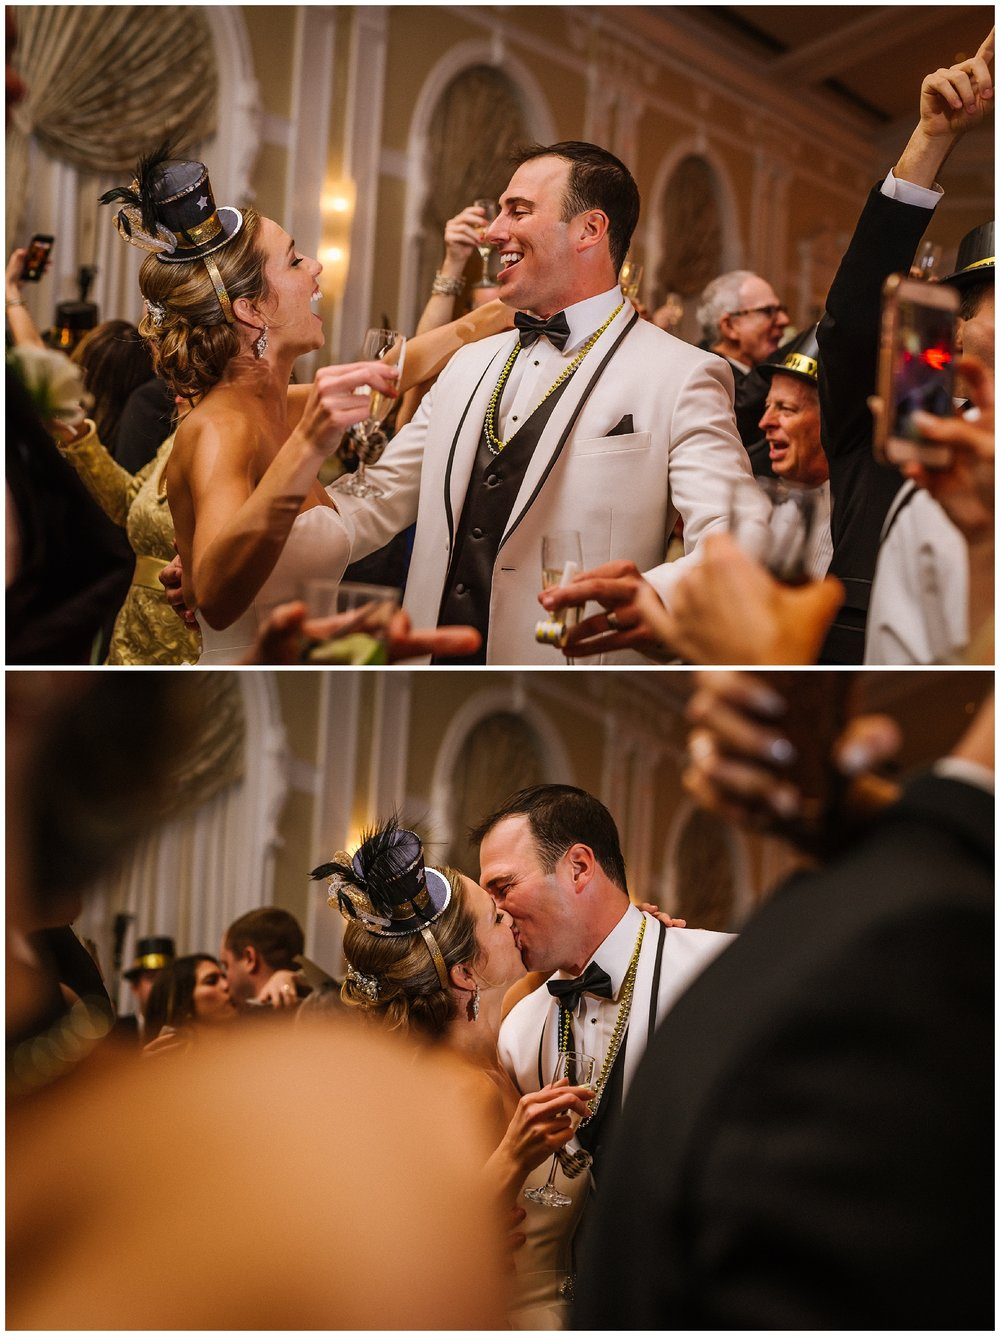 Ashlee-hamon-photography-year-in-review-2016-travel-wanderlust-vsco-adventure-wedding_0124.jpg